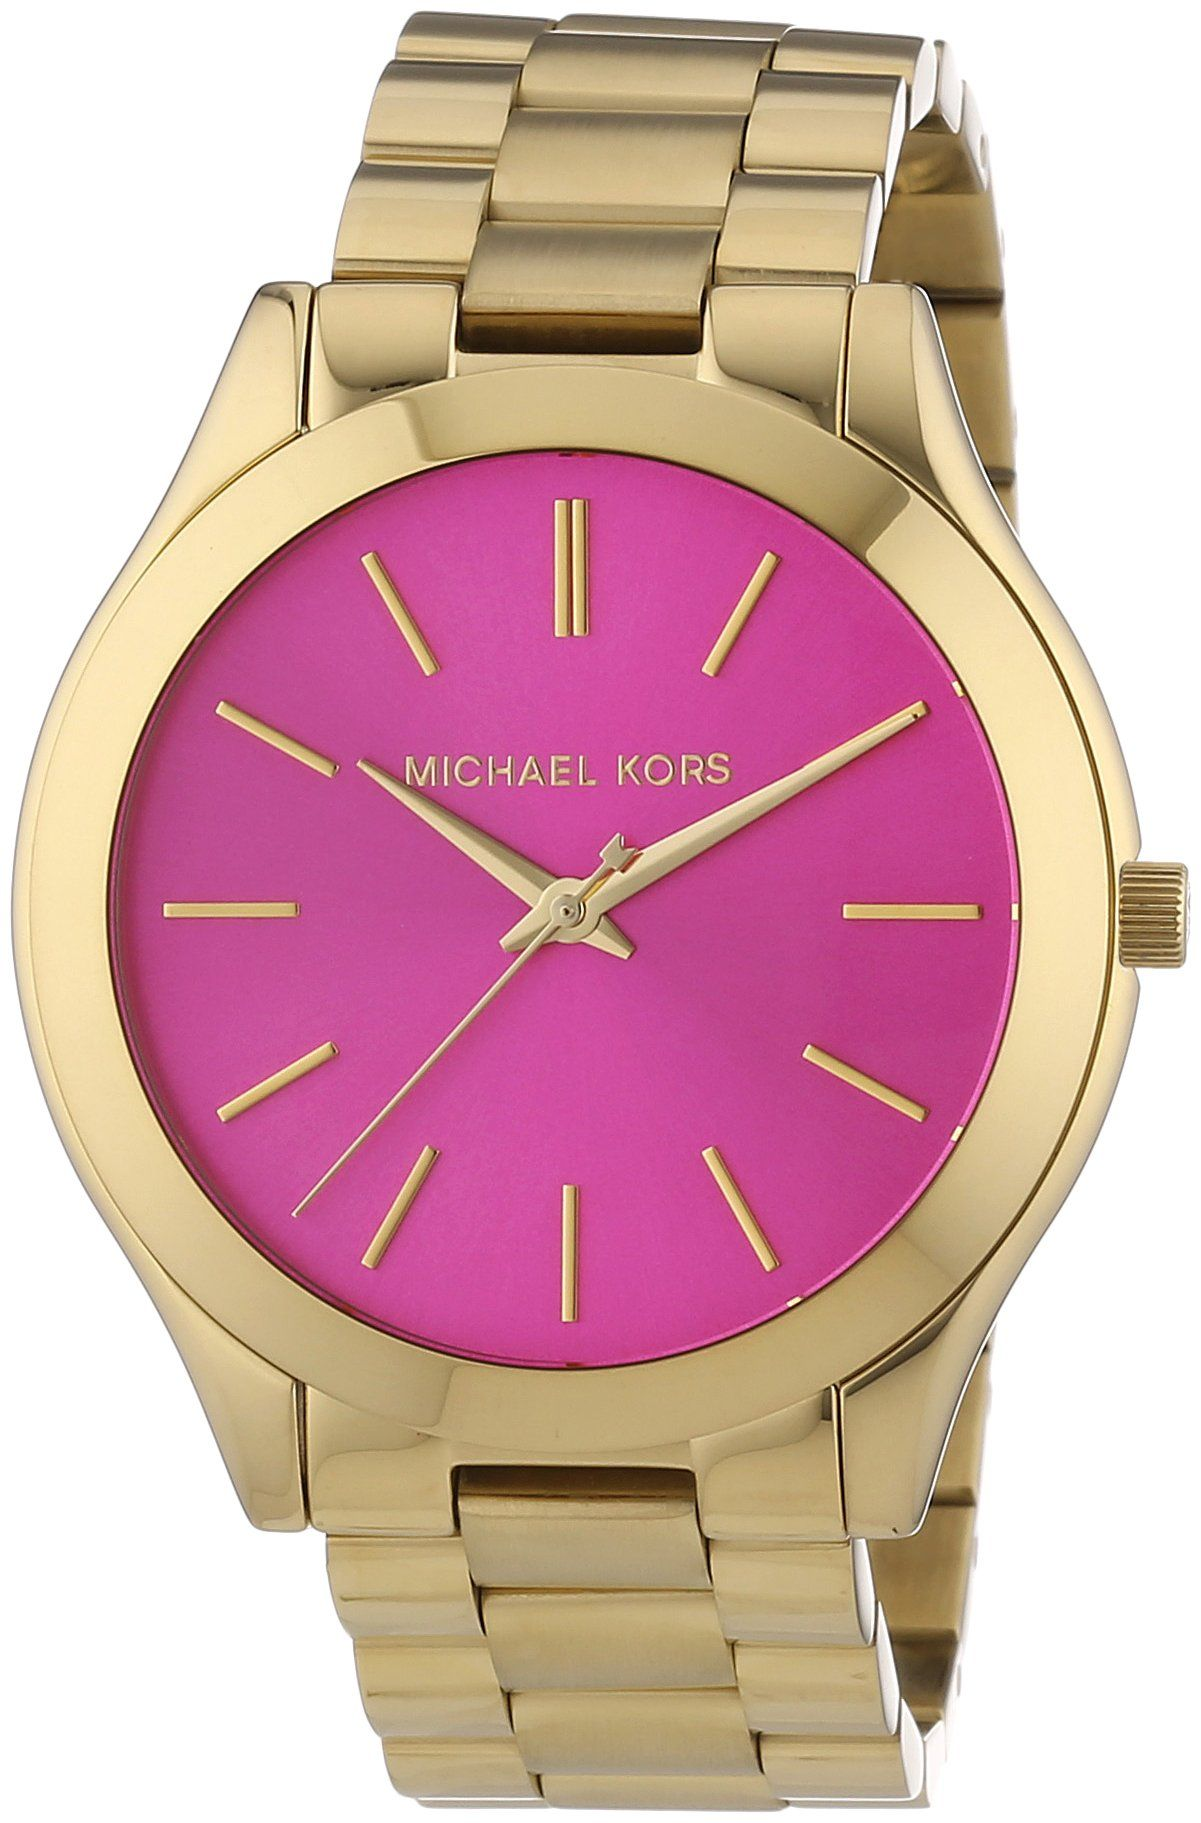 Michael Kors MK3264 - Reloj de cuarzo para mujer, correa ...